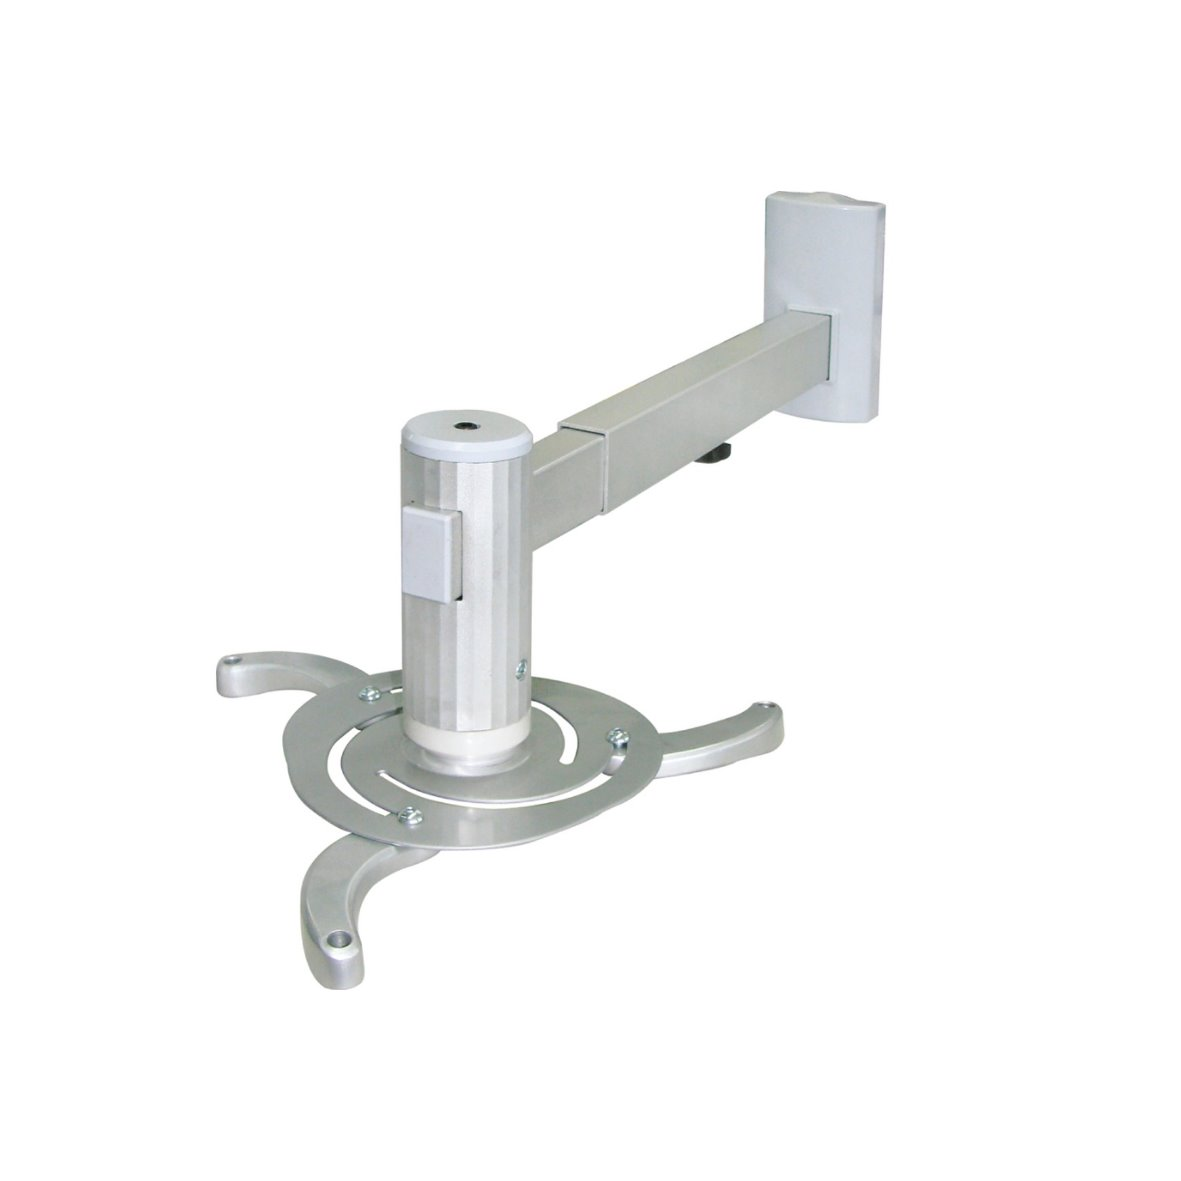 universal halterung beamer projektor halter decke wand alu stahl 360 teleskop ebay. Black Bedroom Furniture Sets. Home Design Ideas